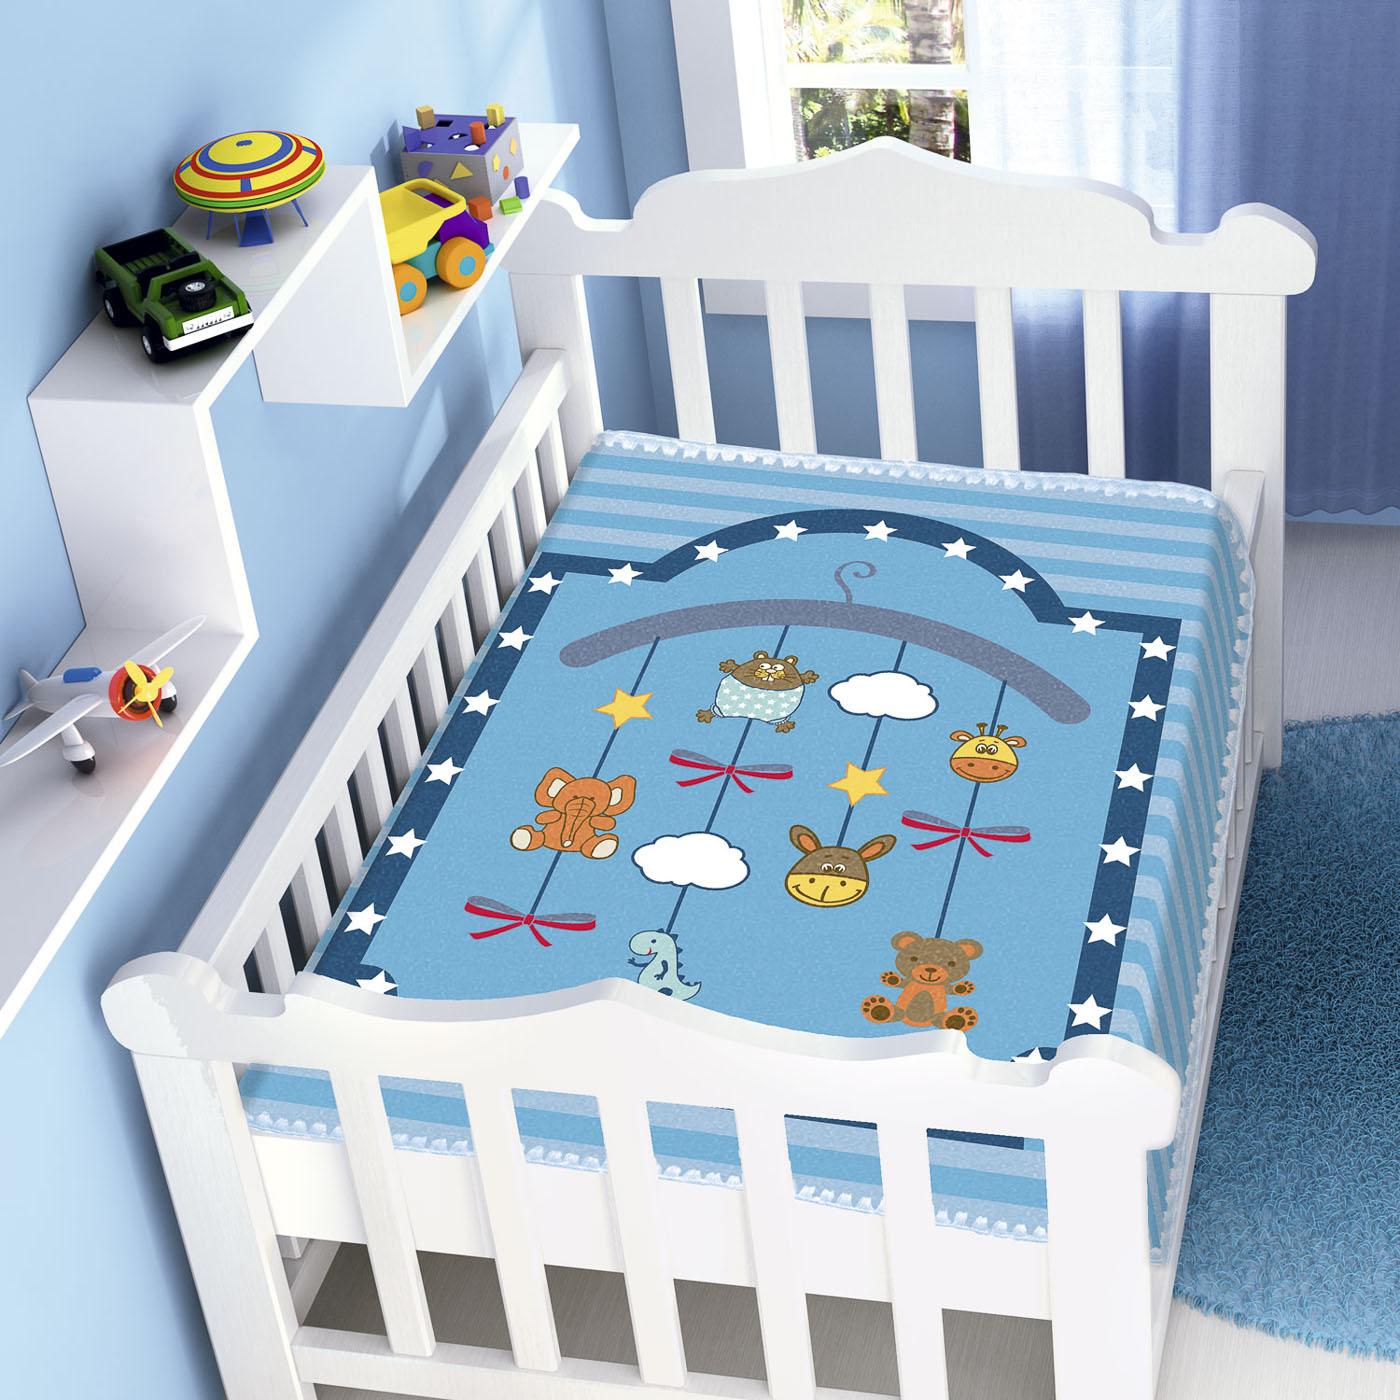 Cobertor Bebê Infantil Jolitex Raschel 0,90x1,10m Mobile